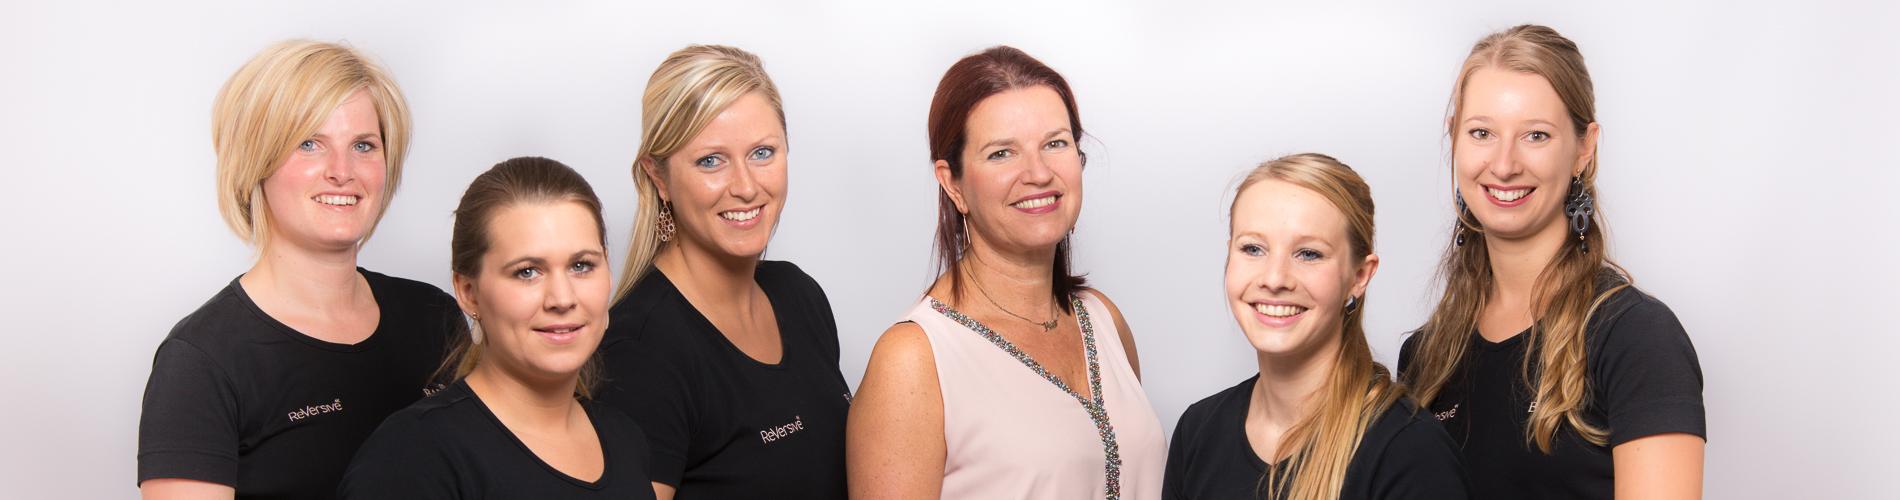 Teamfoto Instituut Hilde Declerck Torhout